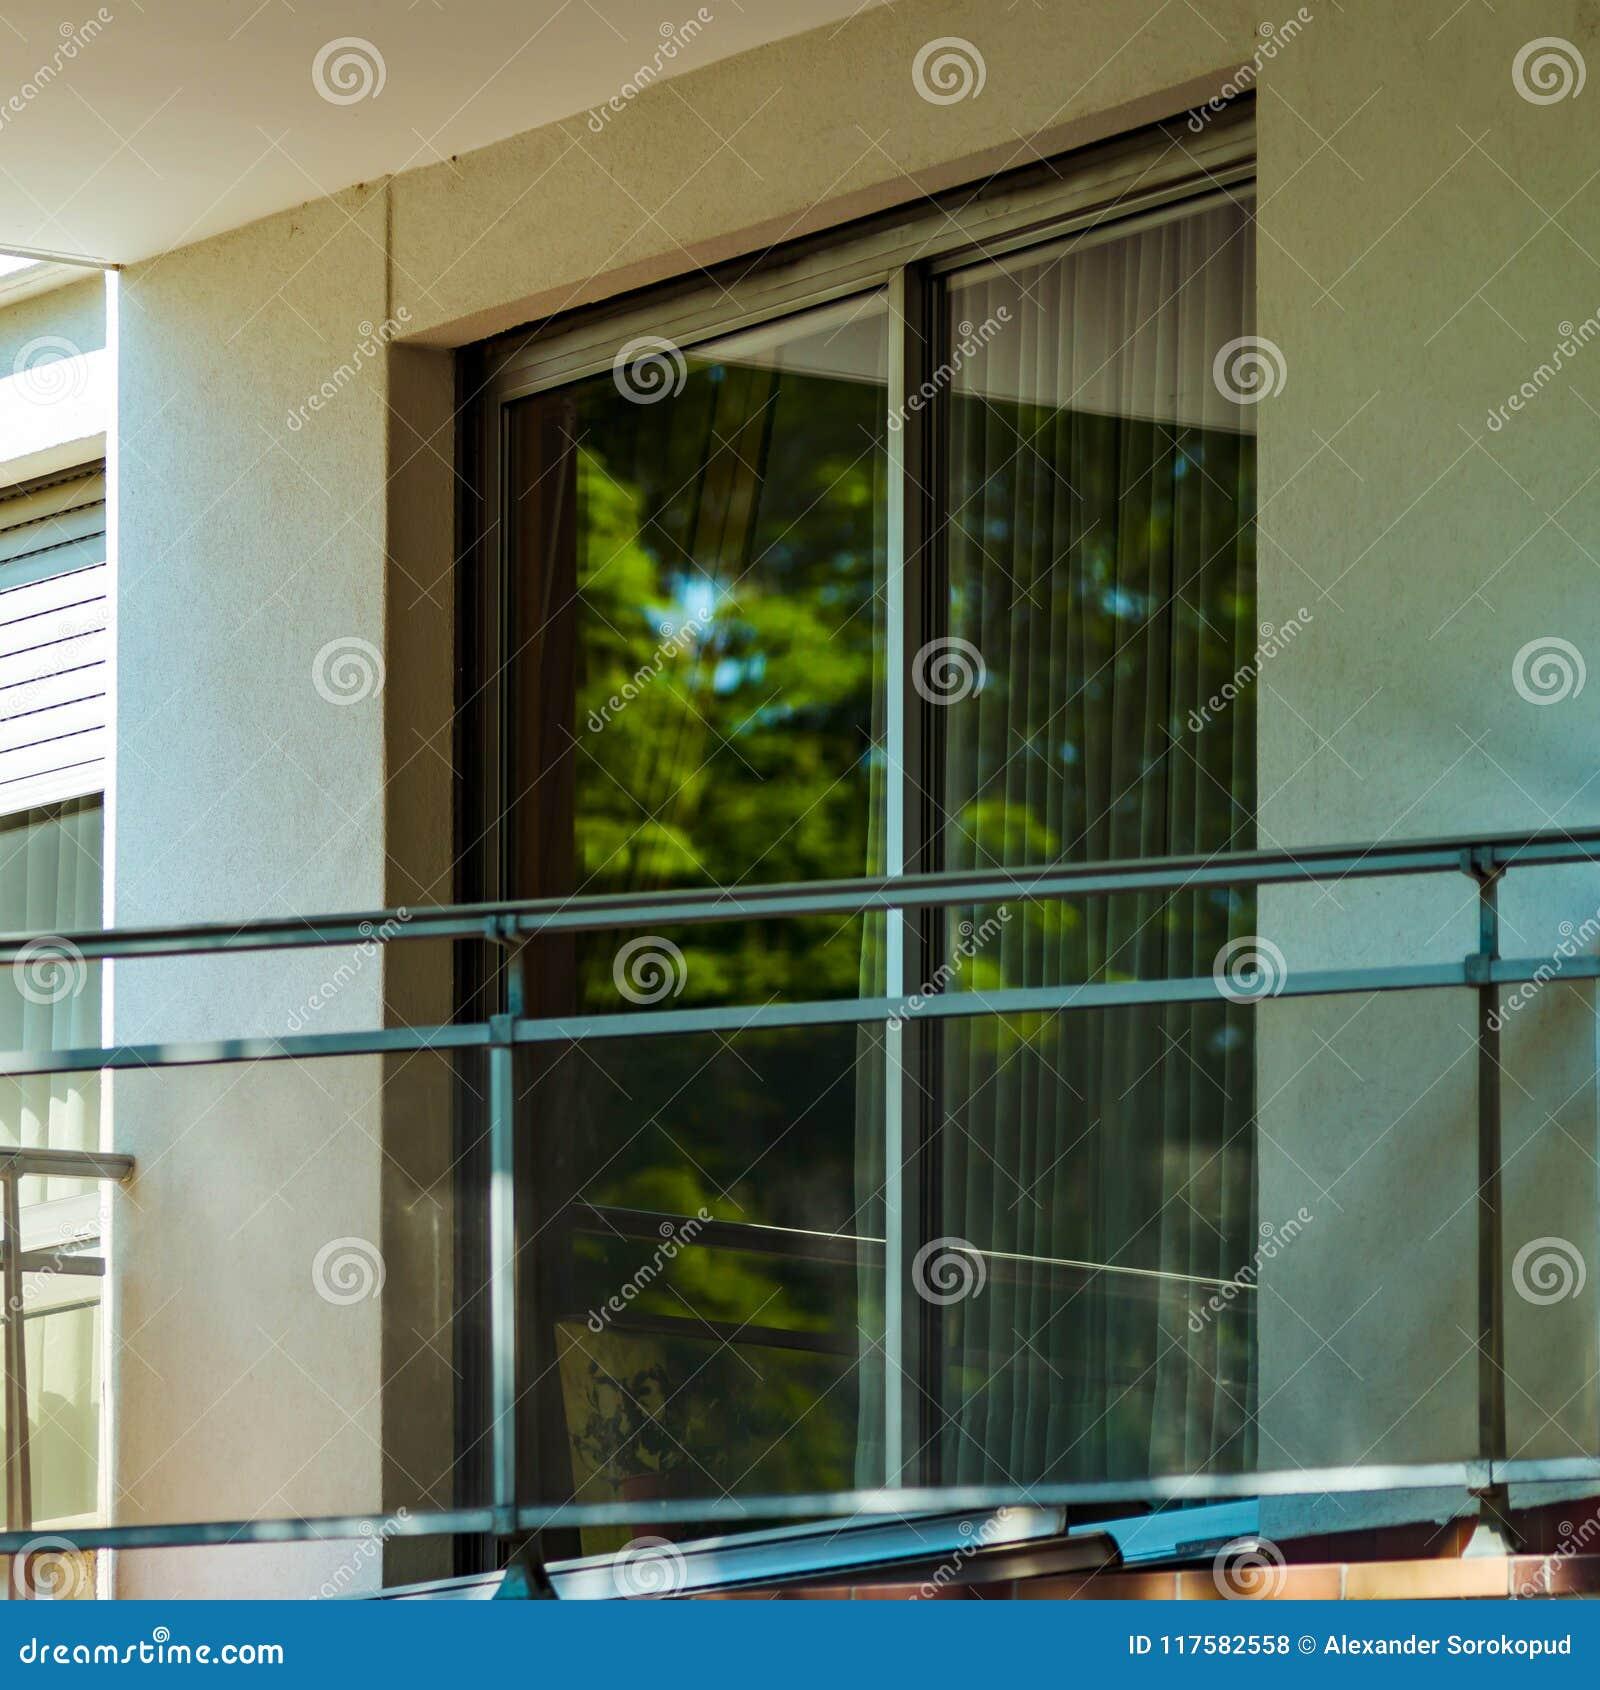 Windows And Balcony, Modern Apartment House Stock Photo